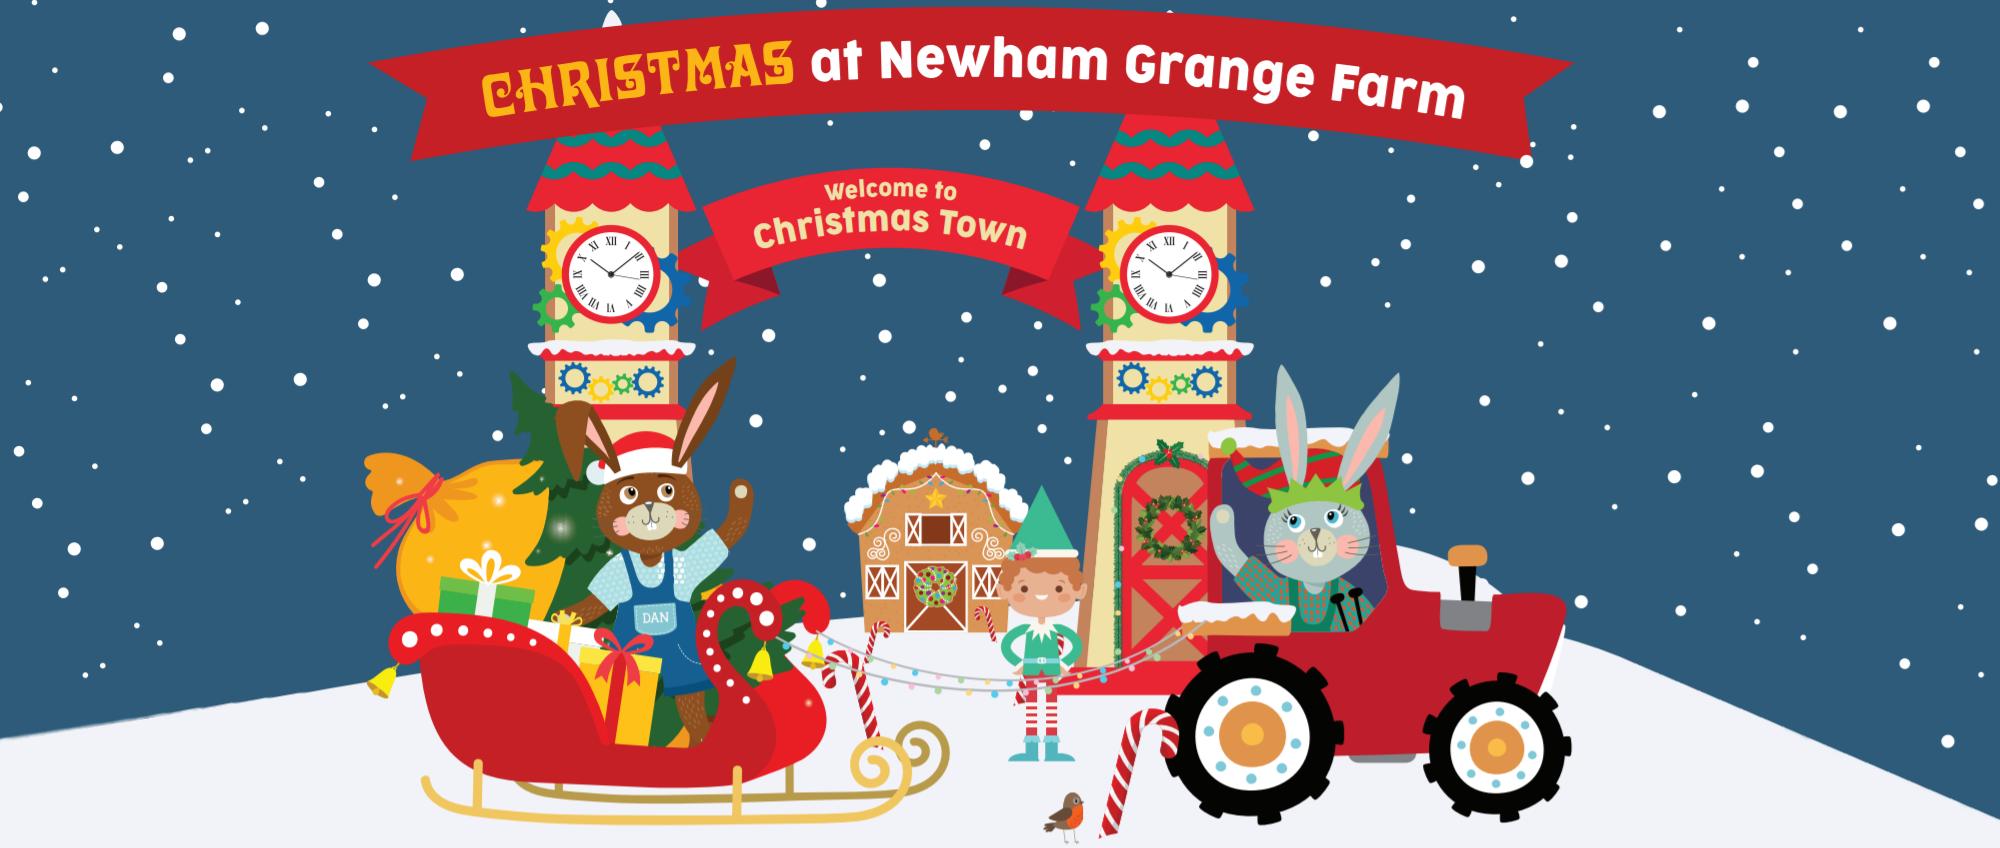 Christmas at Newham Grange